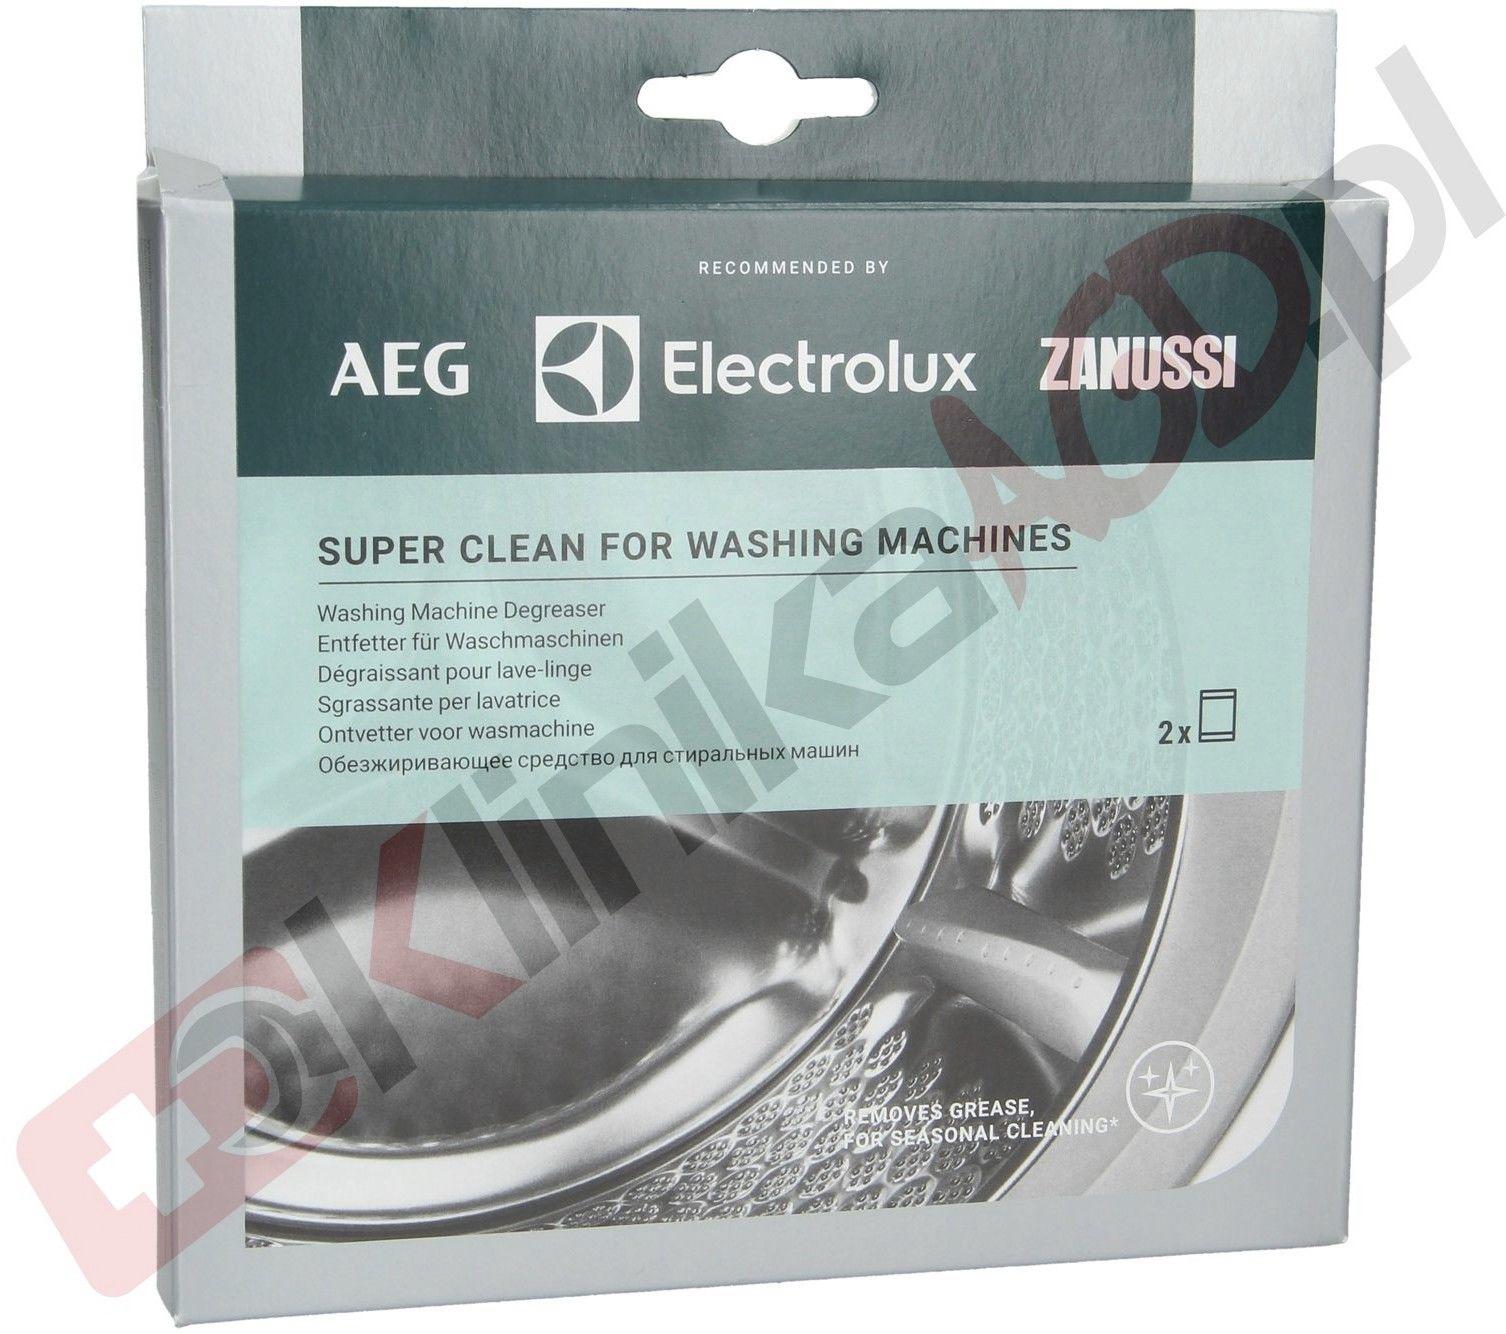 Środek czyszczący Electrolux super clean do pralki proszek 50g 2szt Husqvarna